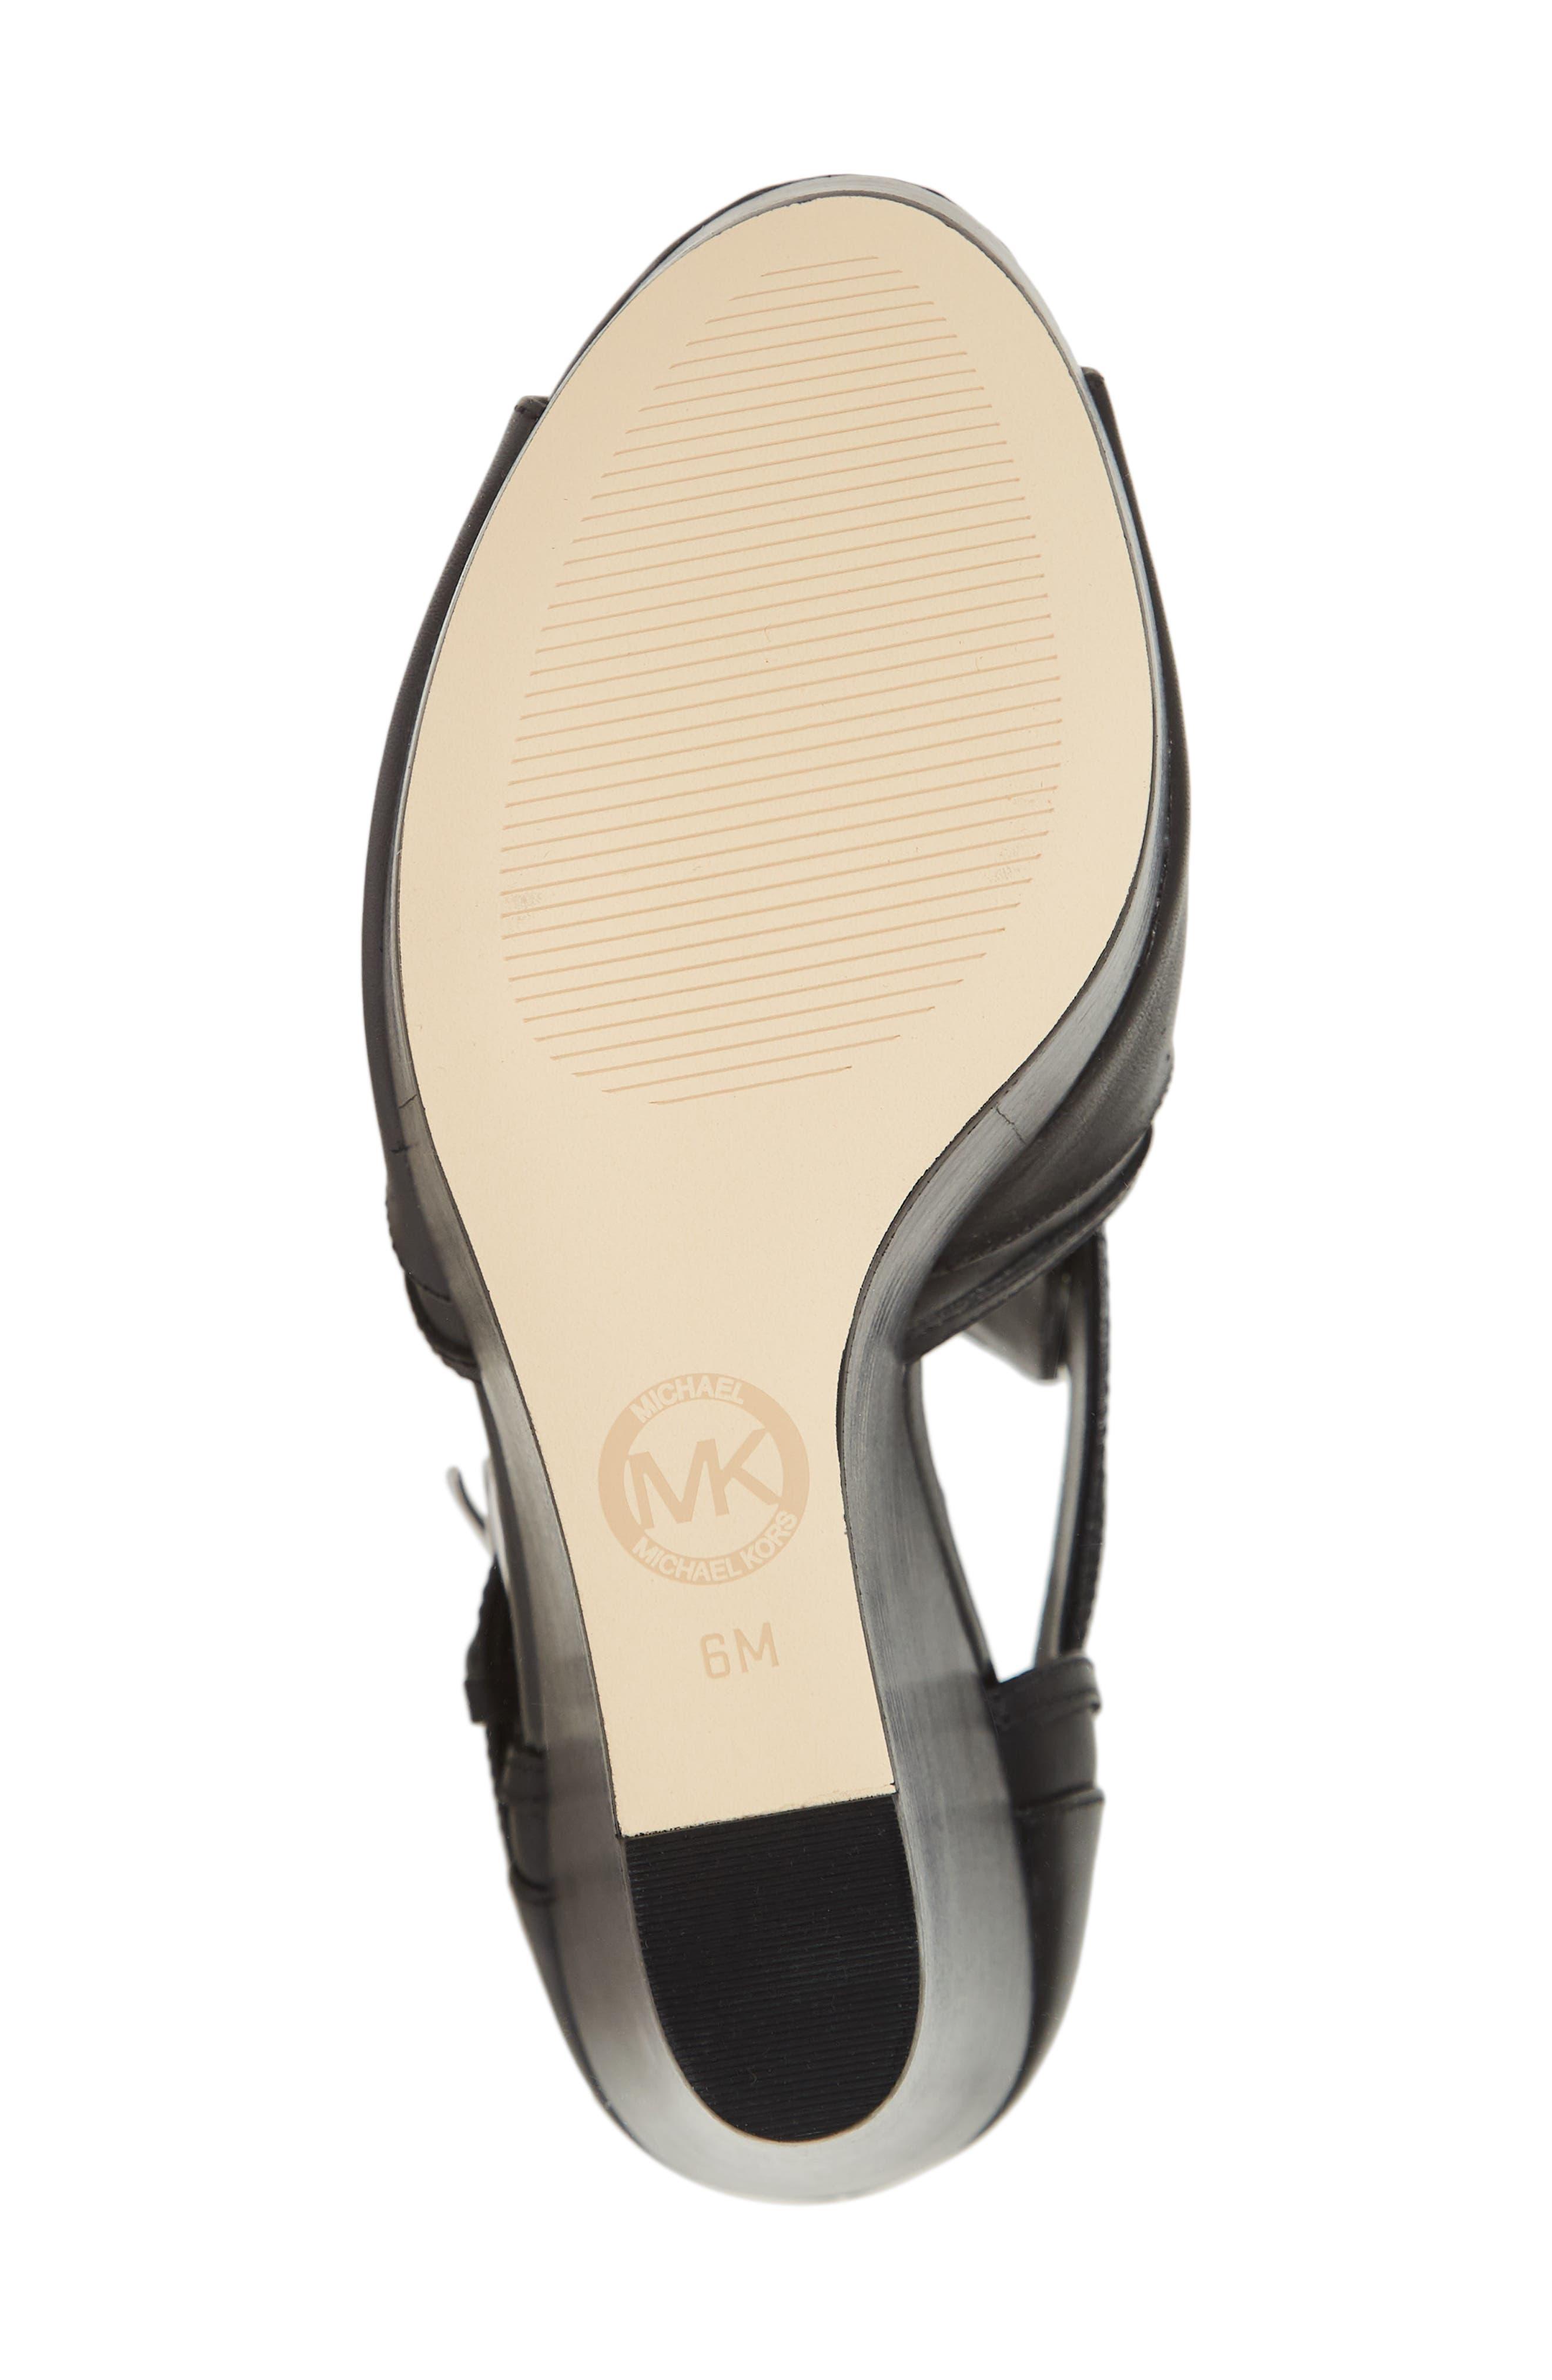 Blaze Wedge Sandal,                             Alternate thumbnail 6, color,                             BLACK VACHETTA LEATHER